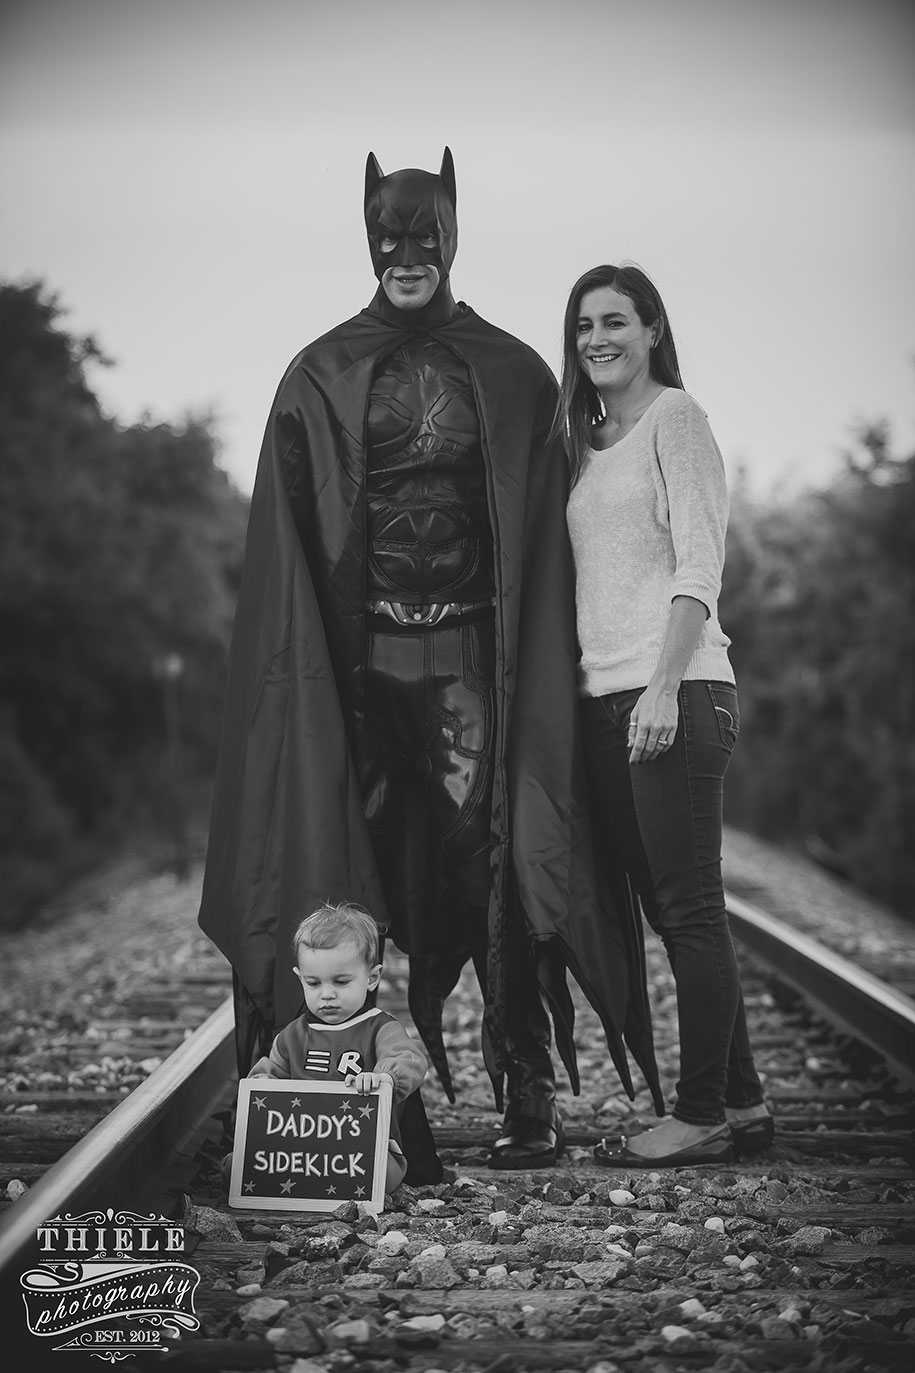 father-son-surprise-batman-robin-photoshoot-eric-thiele-18